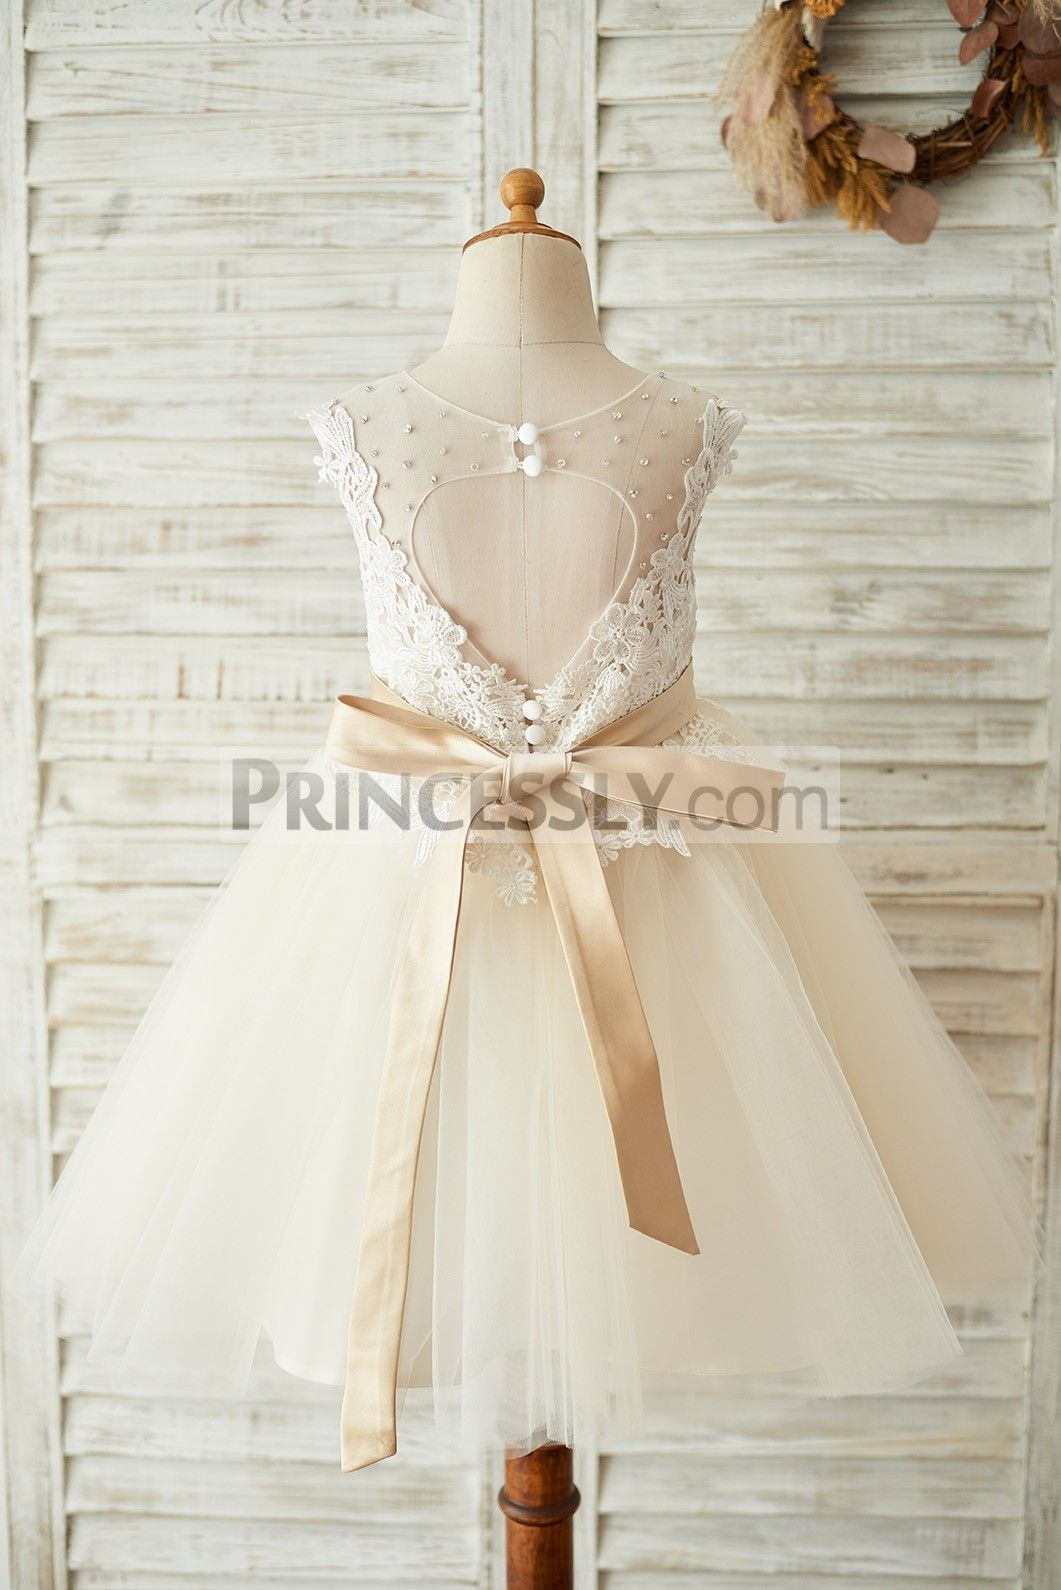 b84f81948 Princessly.com-K1003676-Ivory Lace Champagne Tulle Keyhole Back Wedding  Party Flower Girl Dress with Belt-01